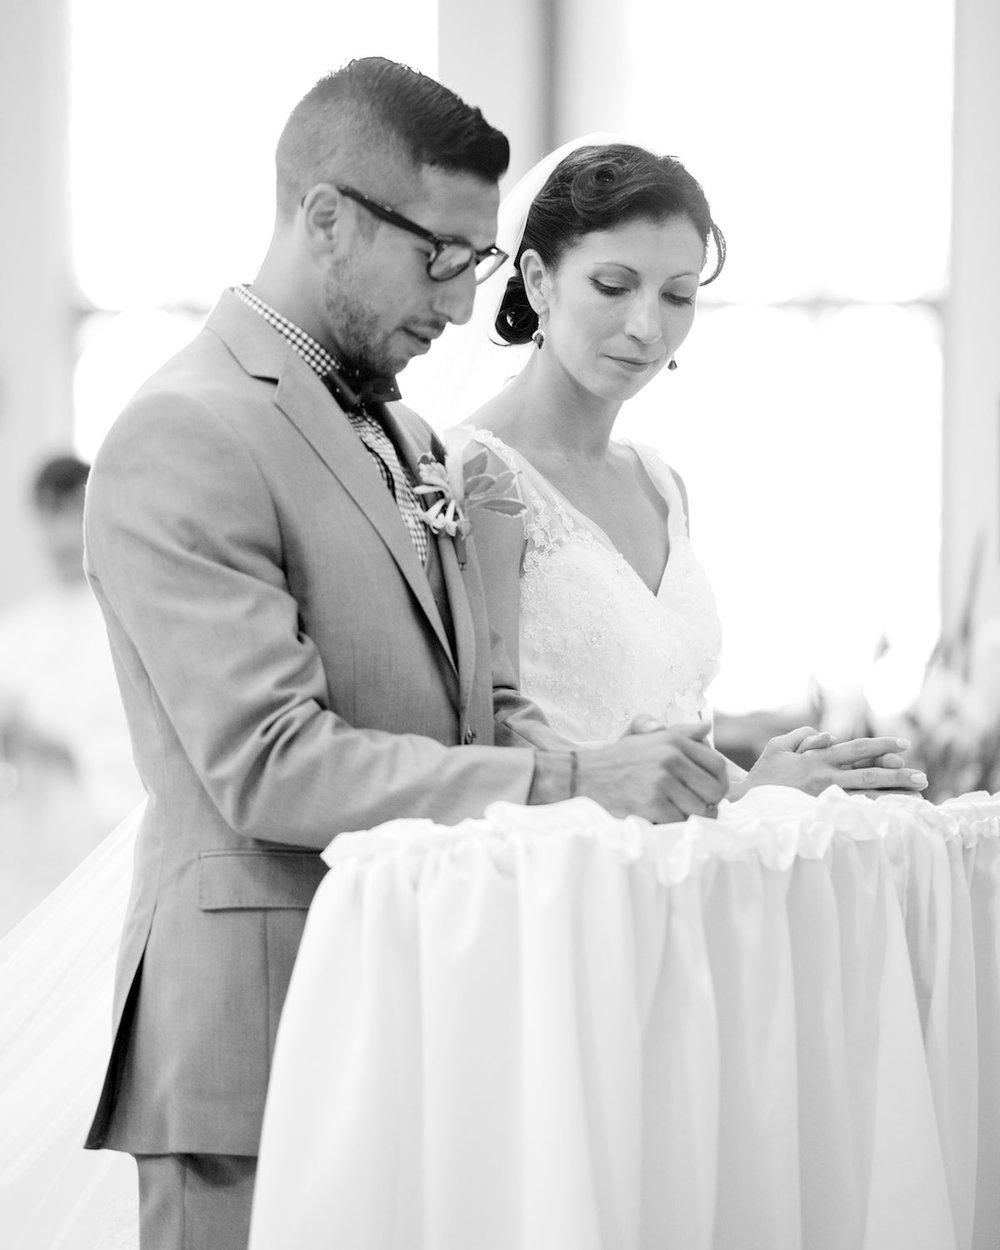 anta-ana-wedding-michal-pfeil-21.jpg